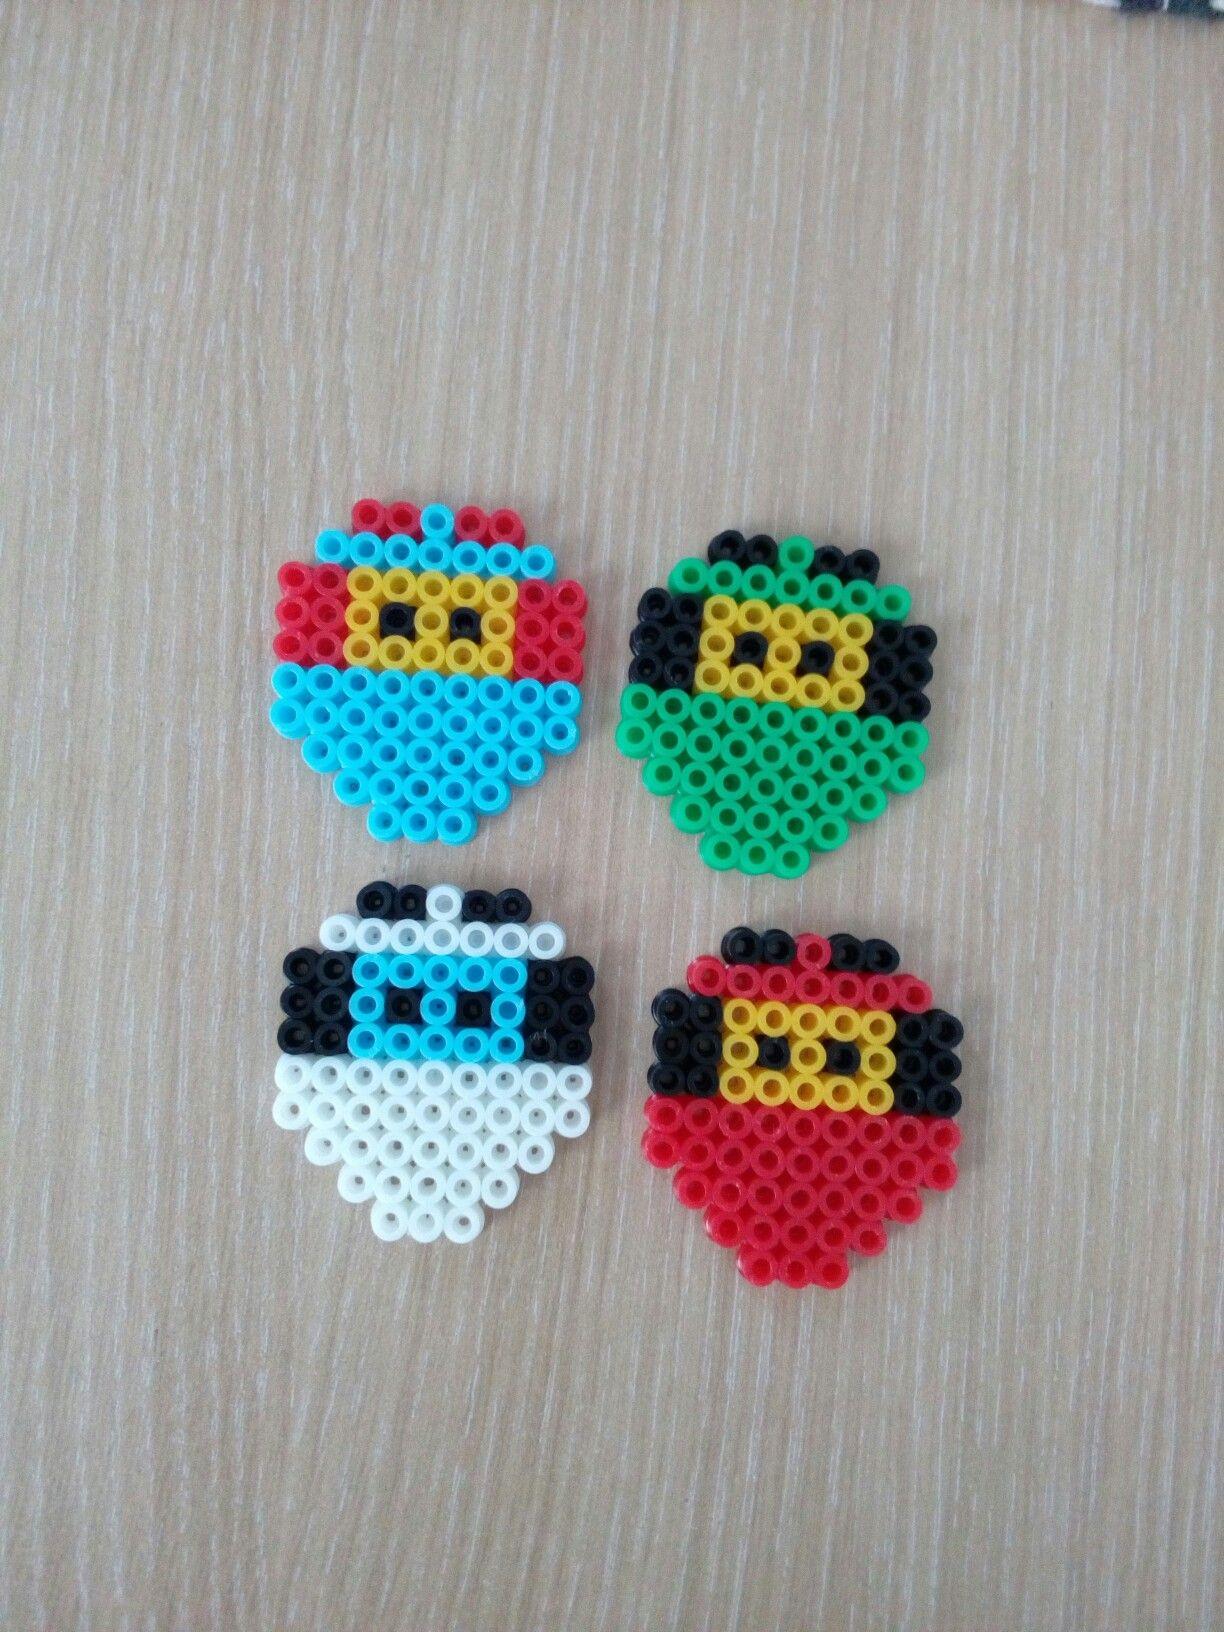 Lego Ninjago Perles à Repasser Perle A Repasser Modeles